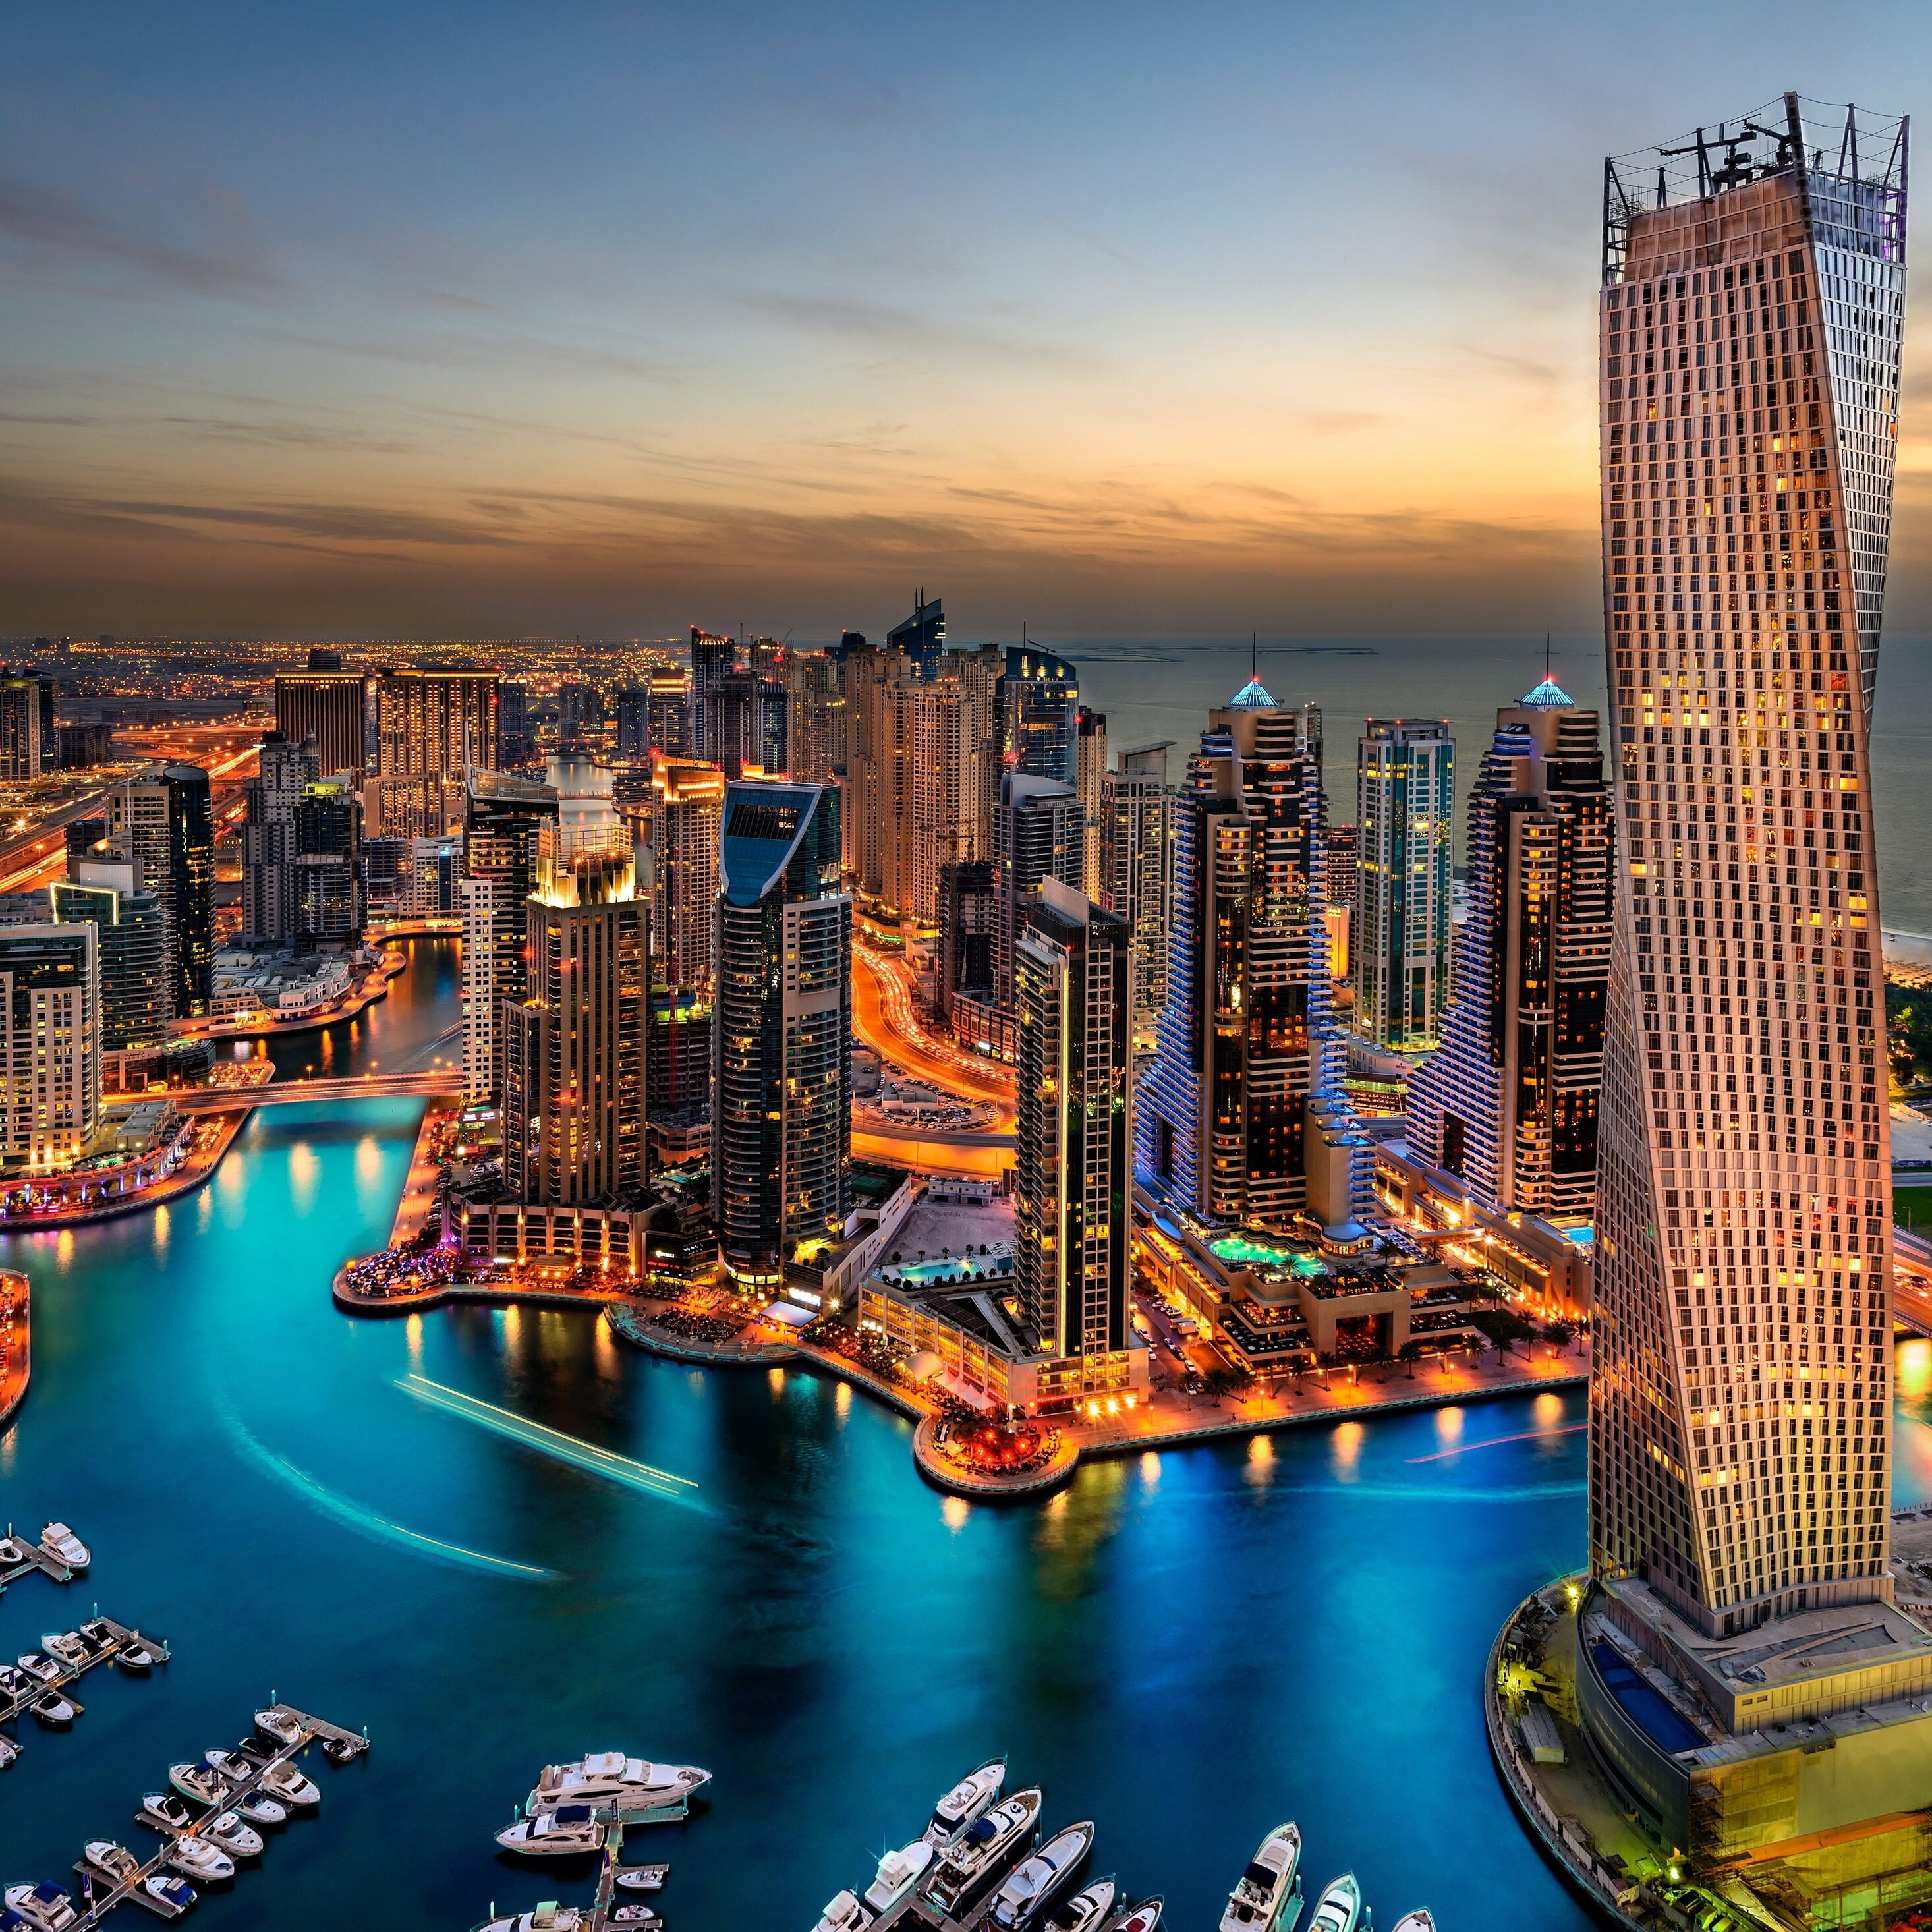 2932x2932 Dubai Uae Building Skyscrappers Night Ipad Pro